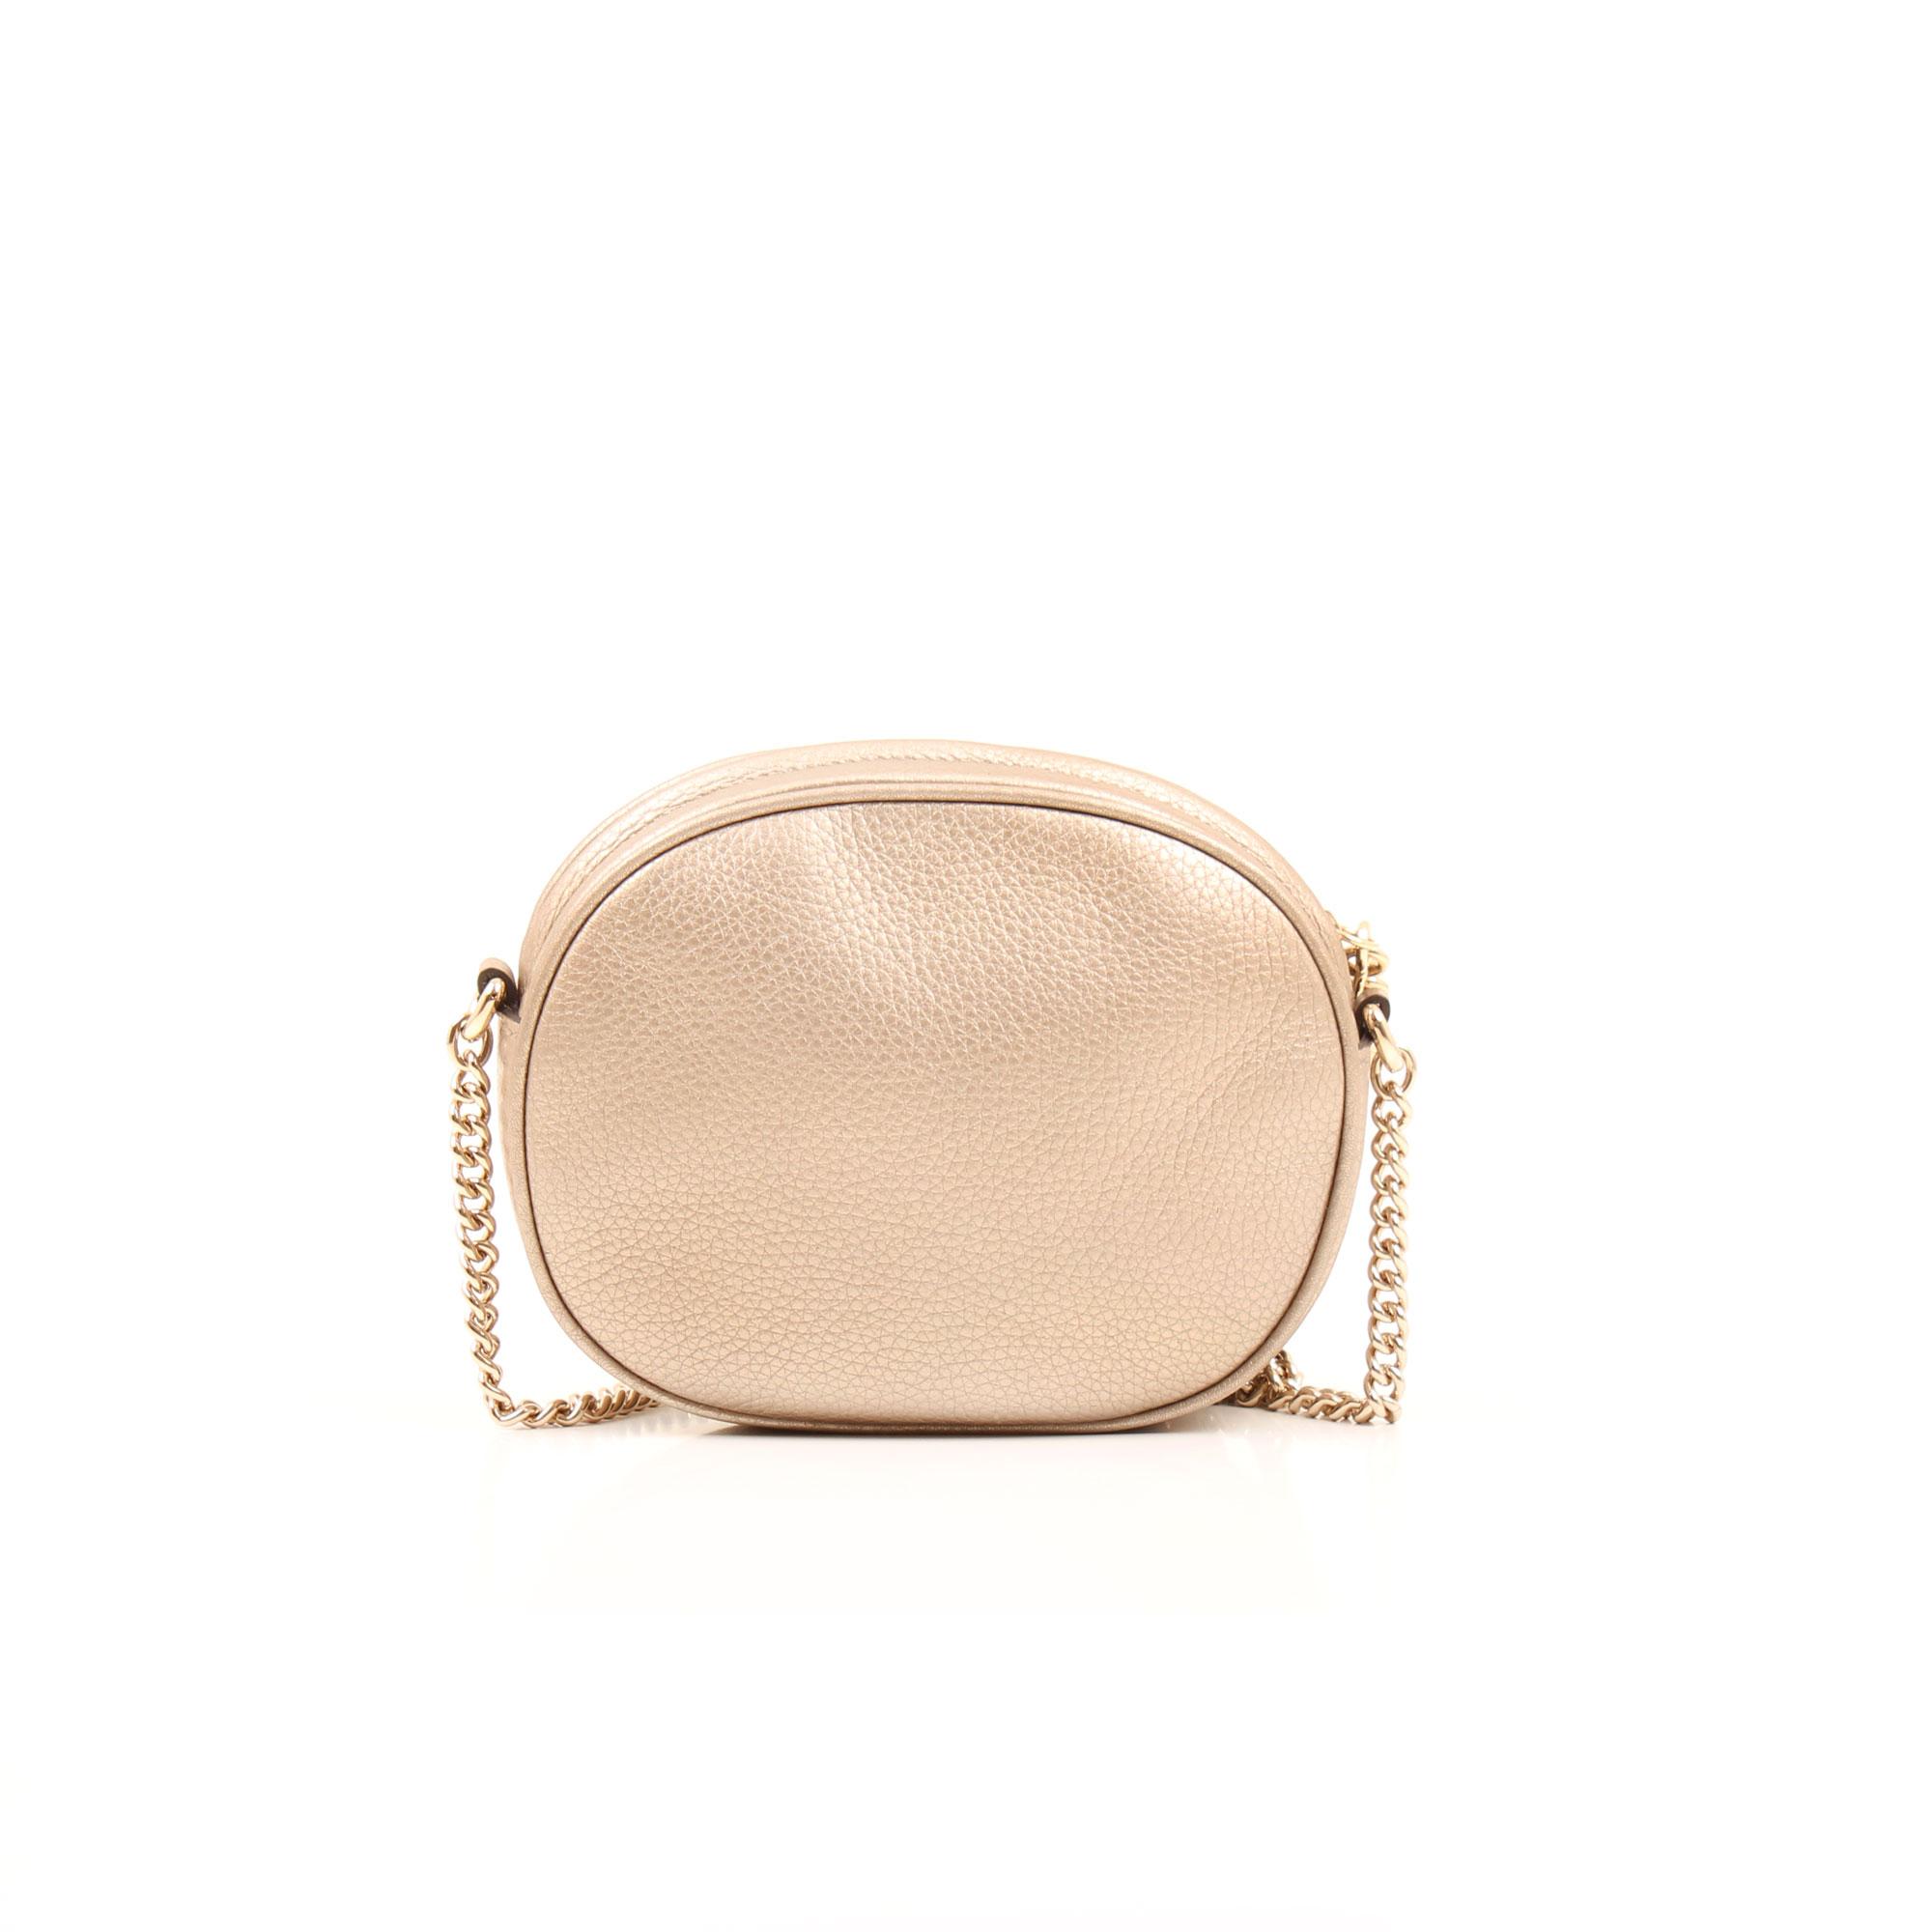 Imagen trasera del bolso soho piel mini cadena bag tornasolado